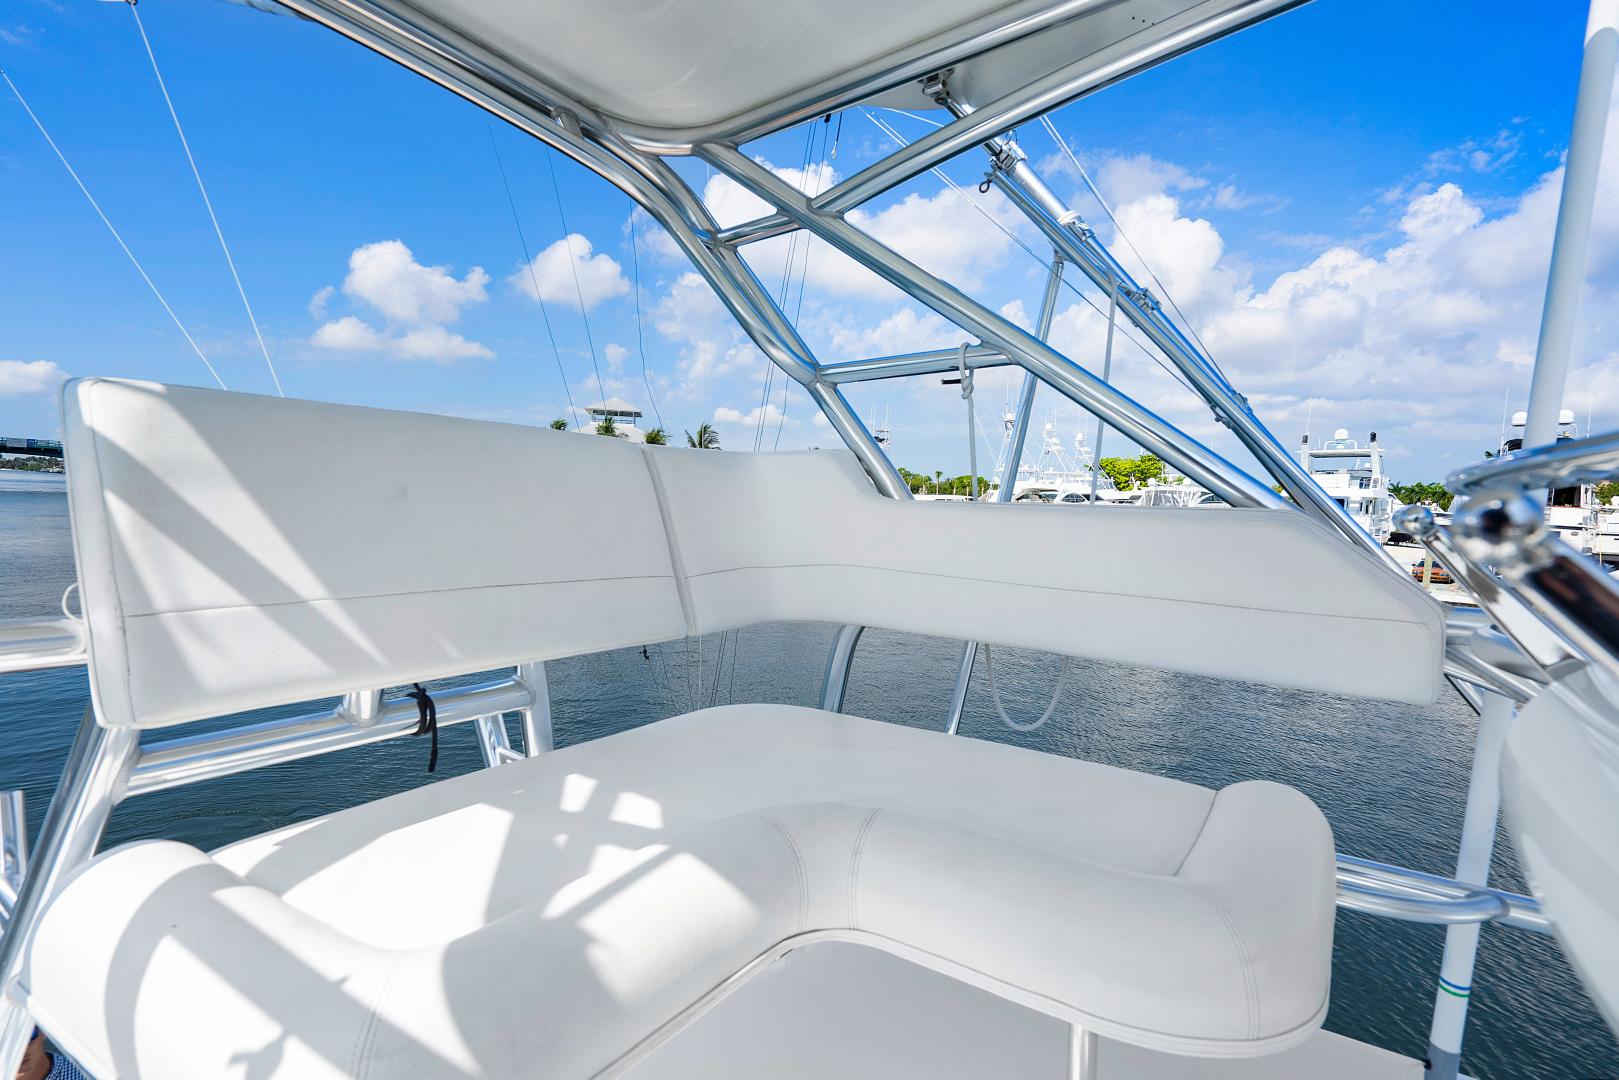 Release-Walkaround 2014-De Bowat Palm Beach Gardens-United States-1364503 | Thumbnail